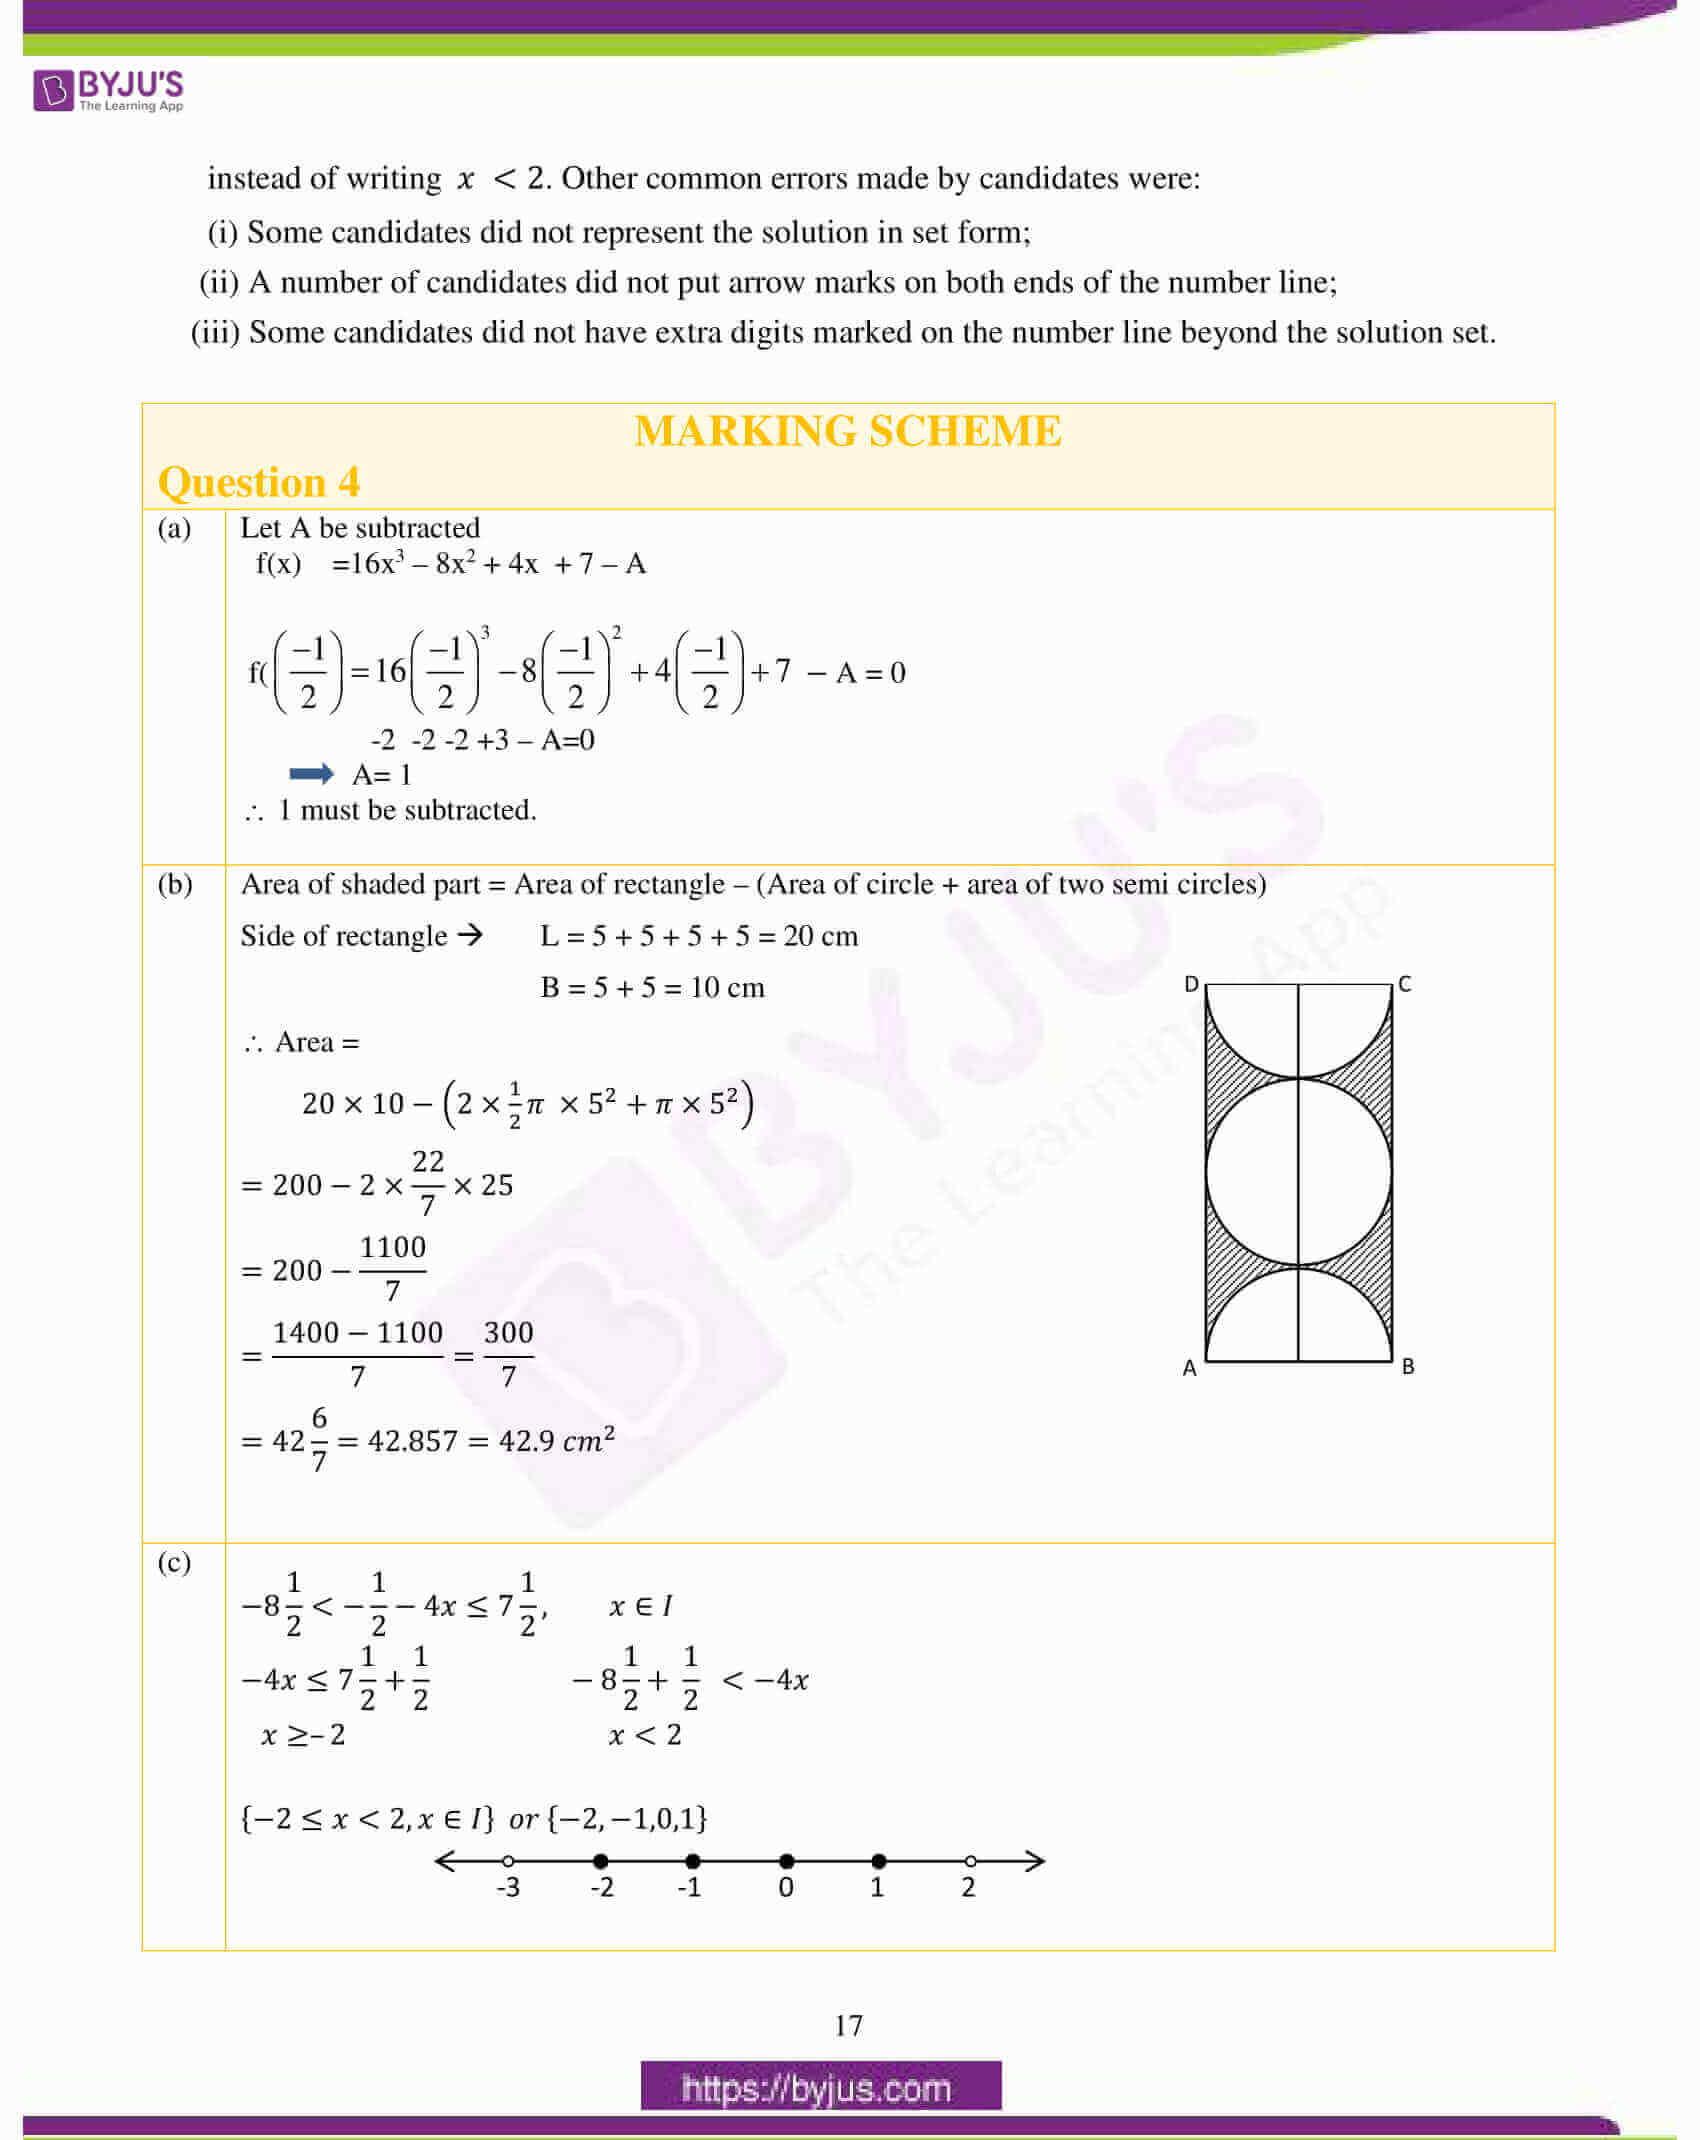 icse class 10 maths question paper solution 2017 08